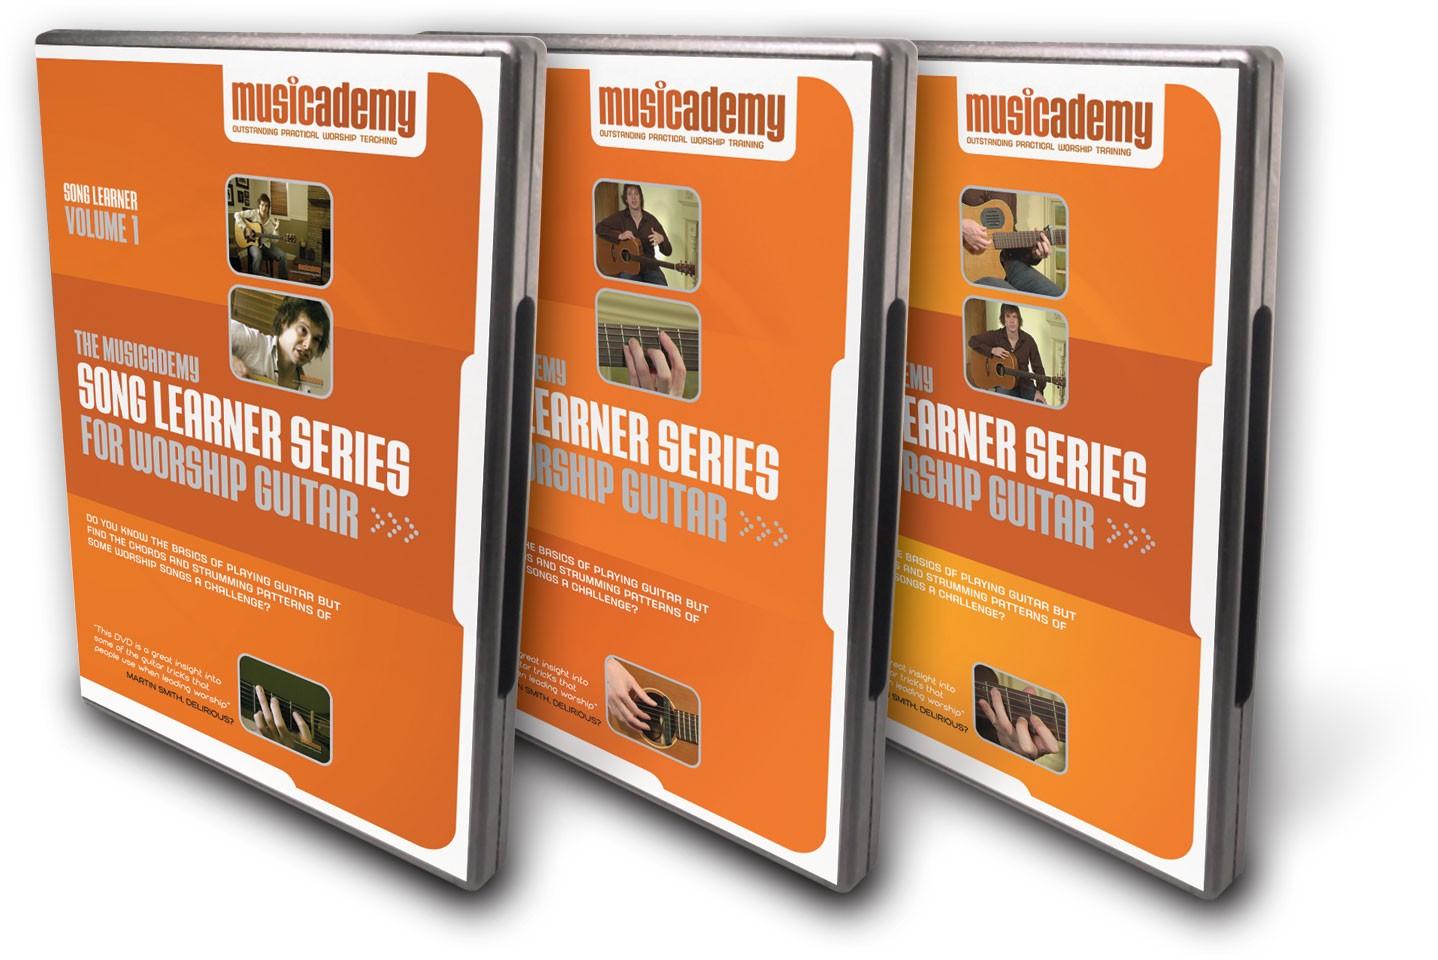 Song Learner Guitar Combo 3 Dvds